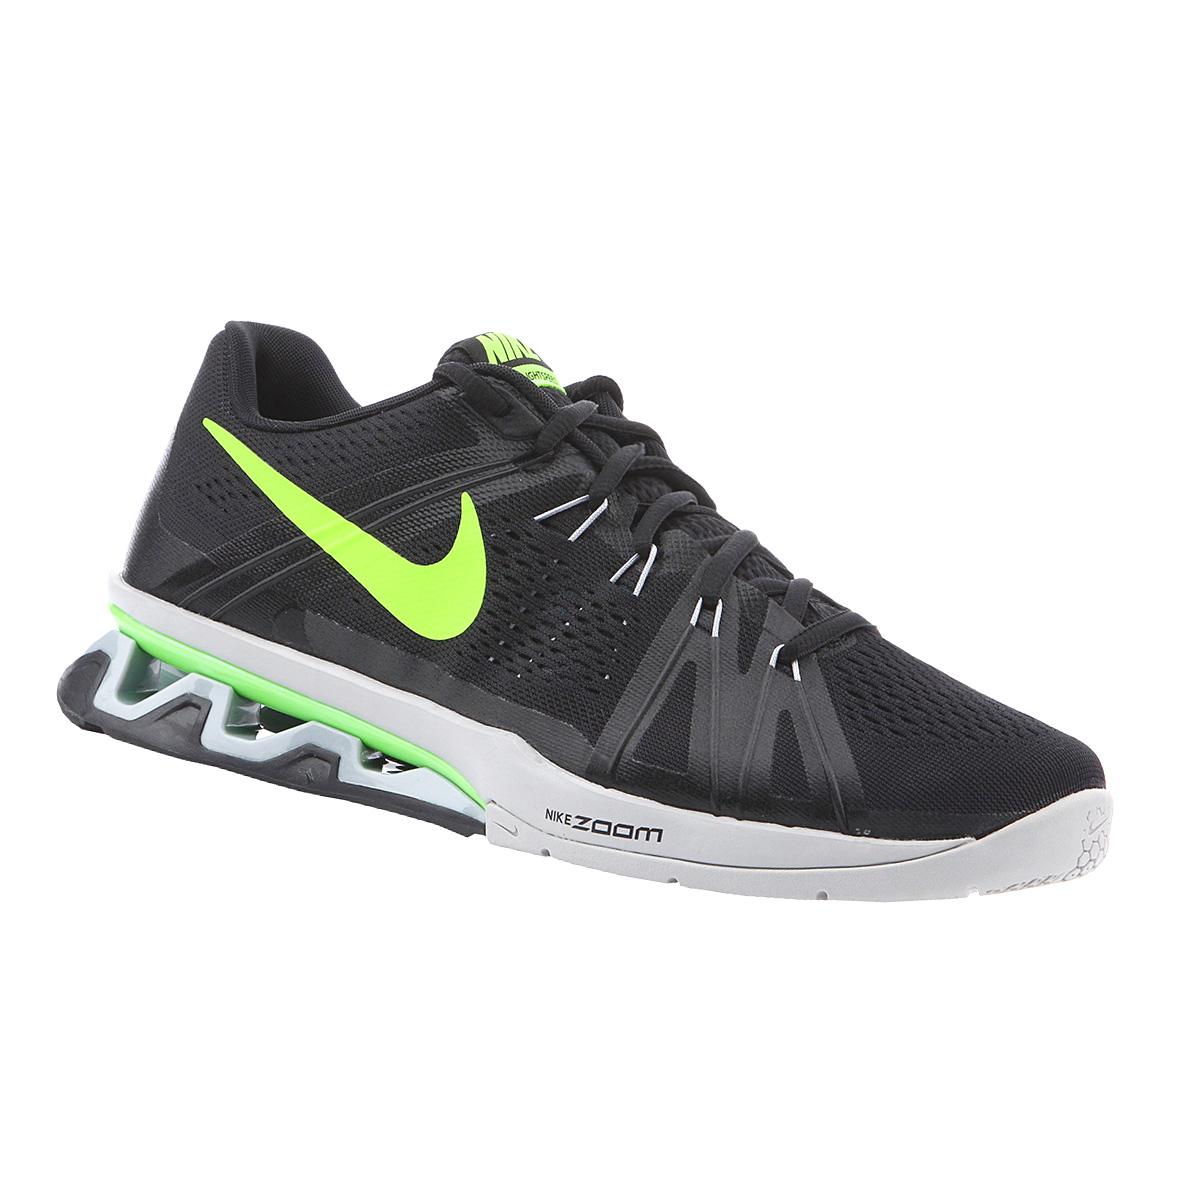 7b8f9ba6dc8c NEW Nike Reax Lightspeed 807194-007 Men  s Shoes Trainers Sneakers ...